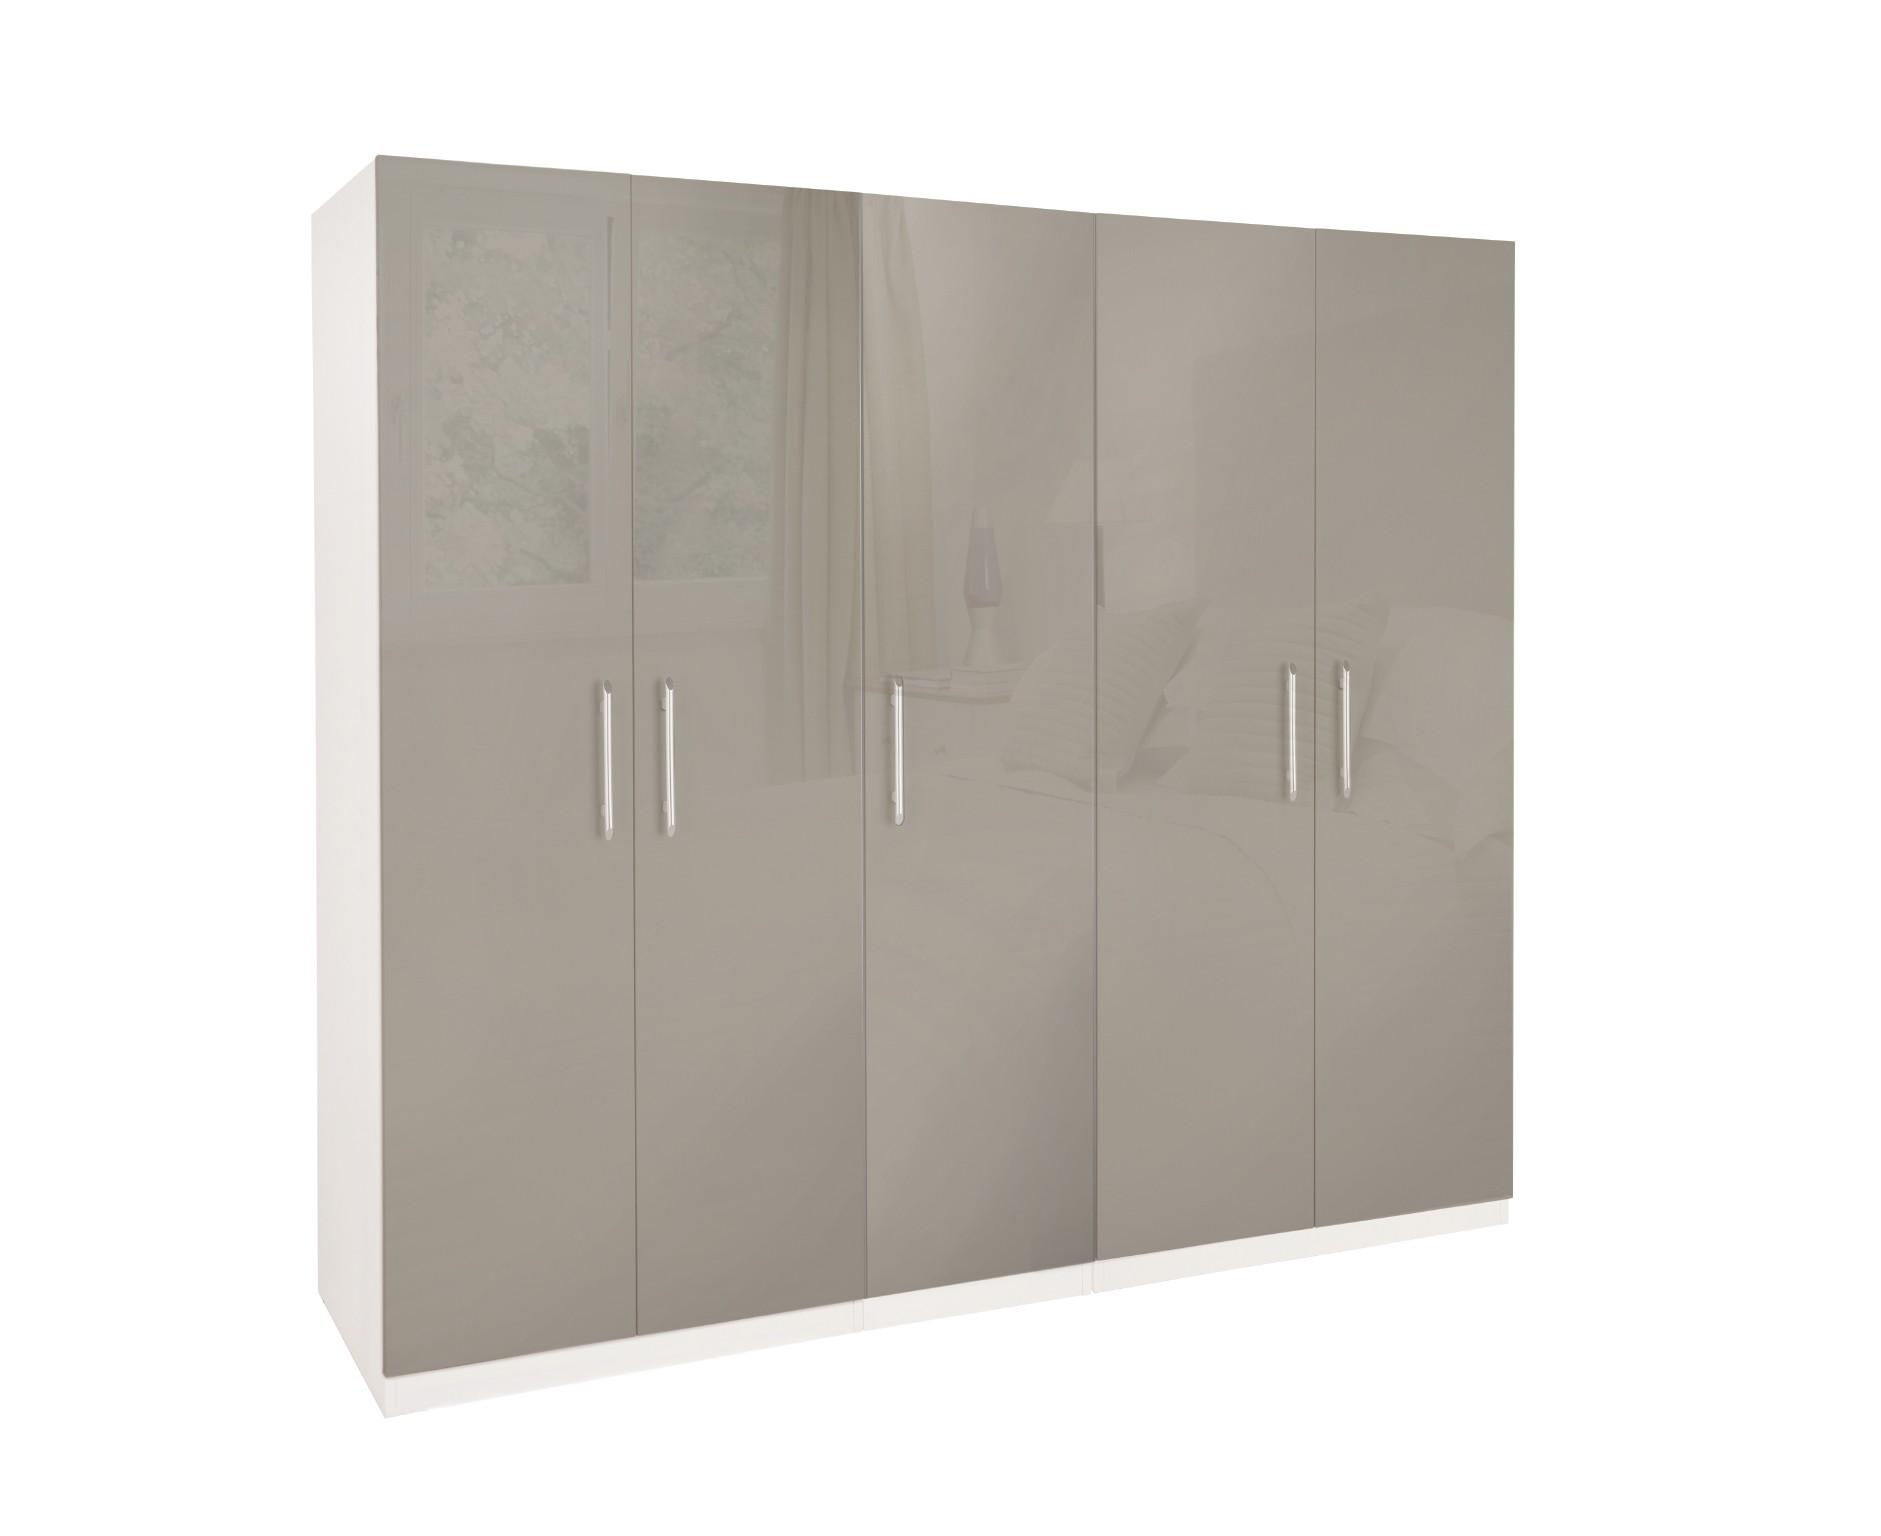 Bayswater High Gloss 5 Door Wardrobe